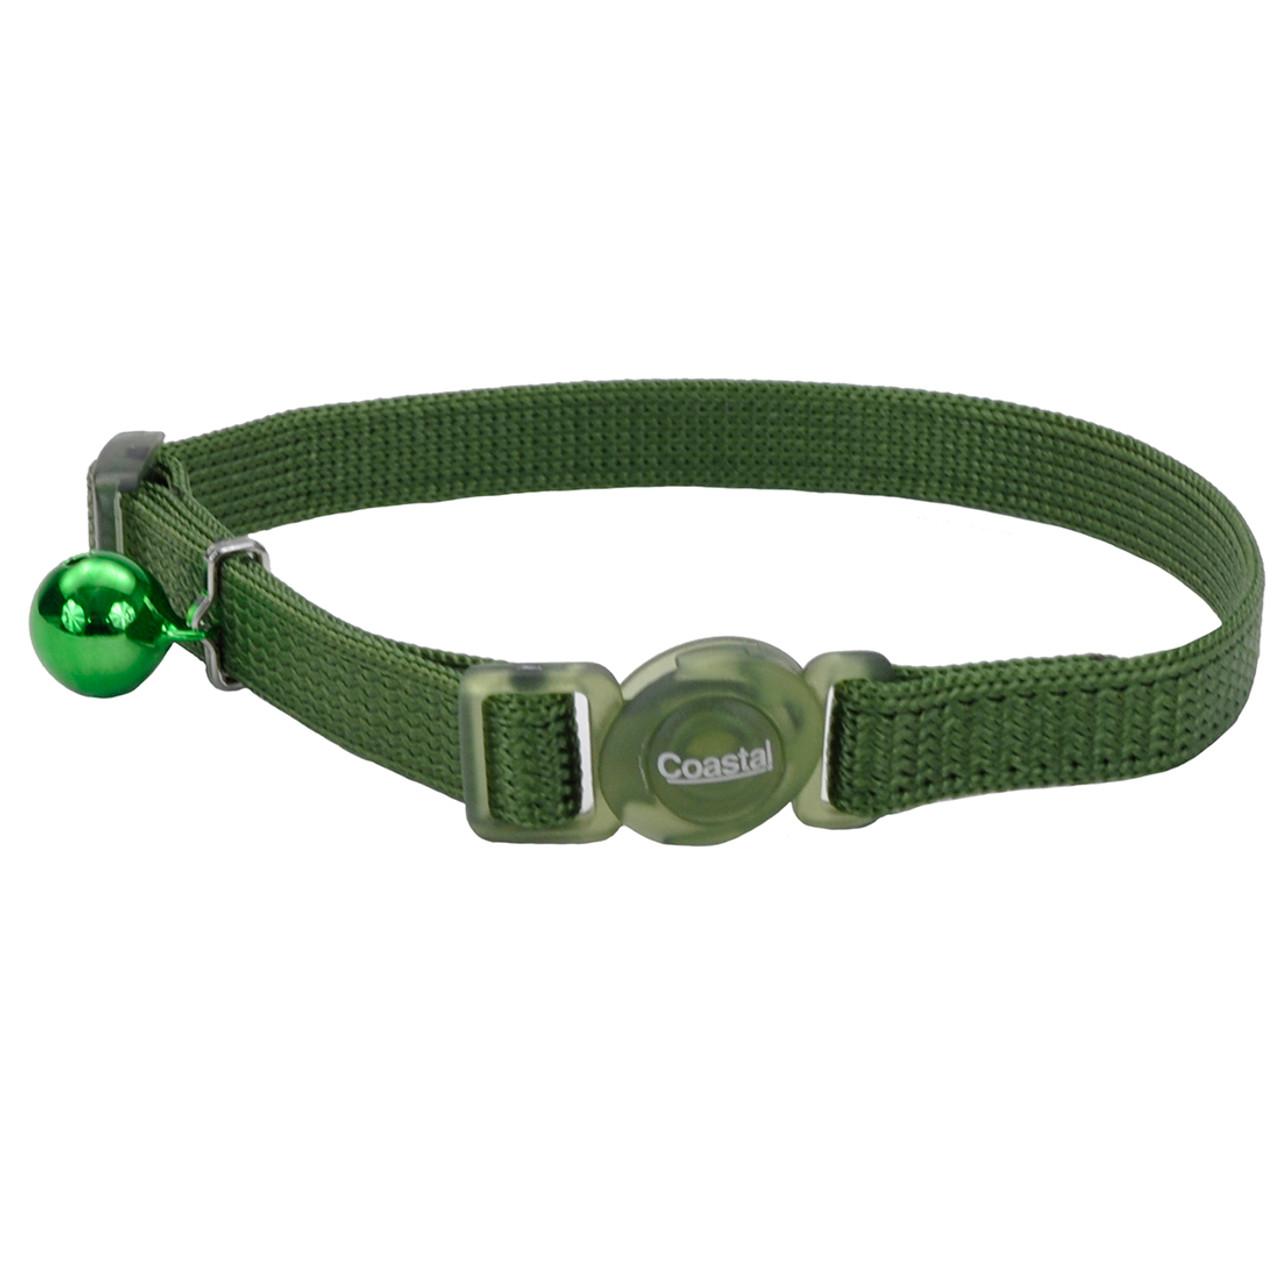 Safe Cat Adjustable Snag-Proof Breakaway Palm Green Cat Collar